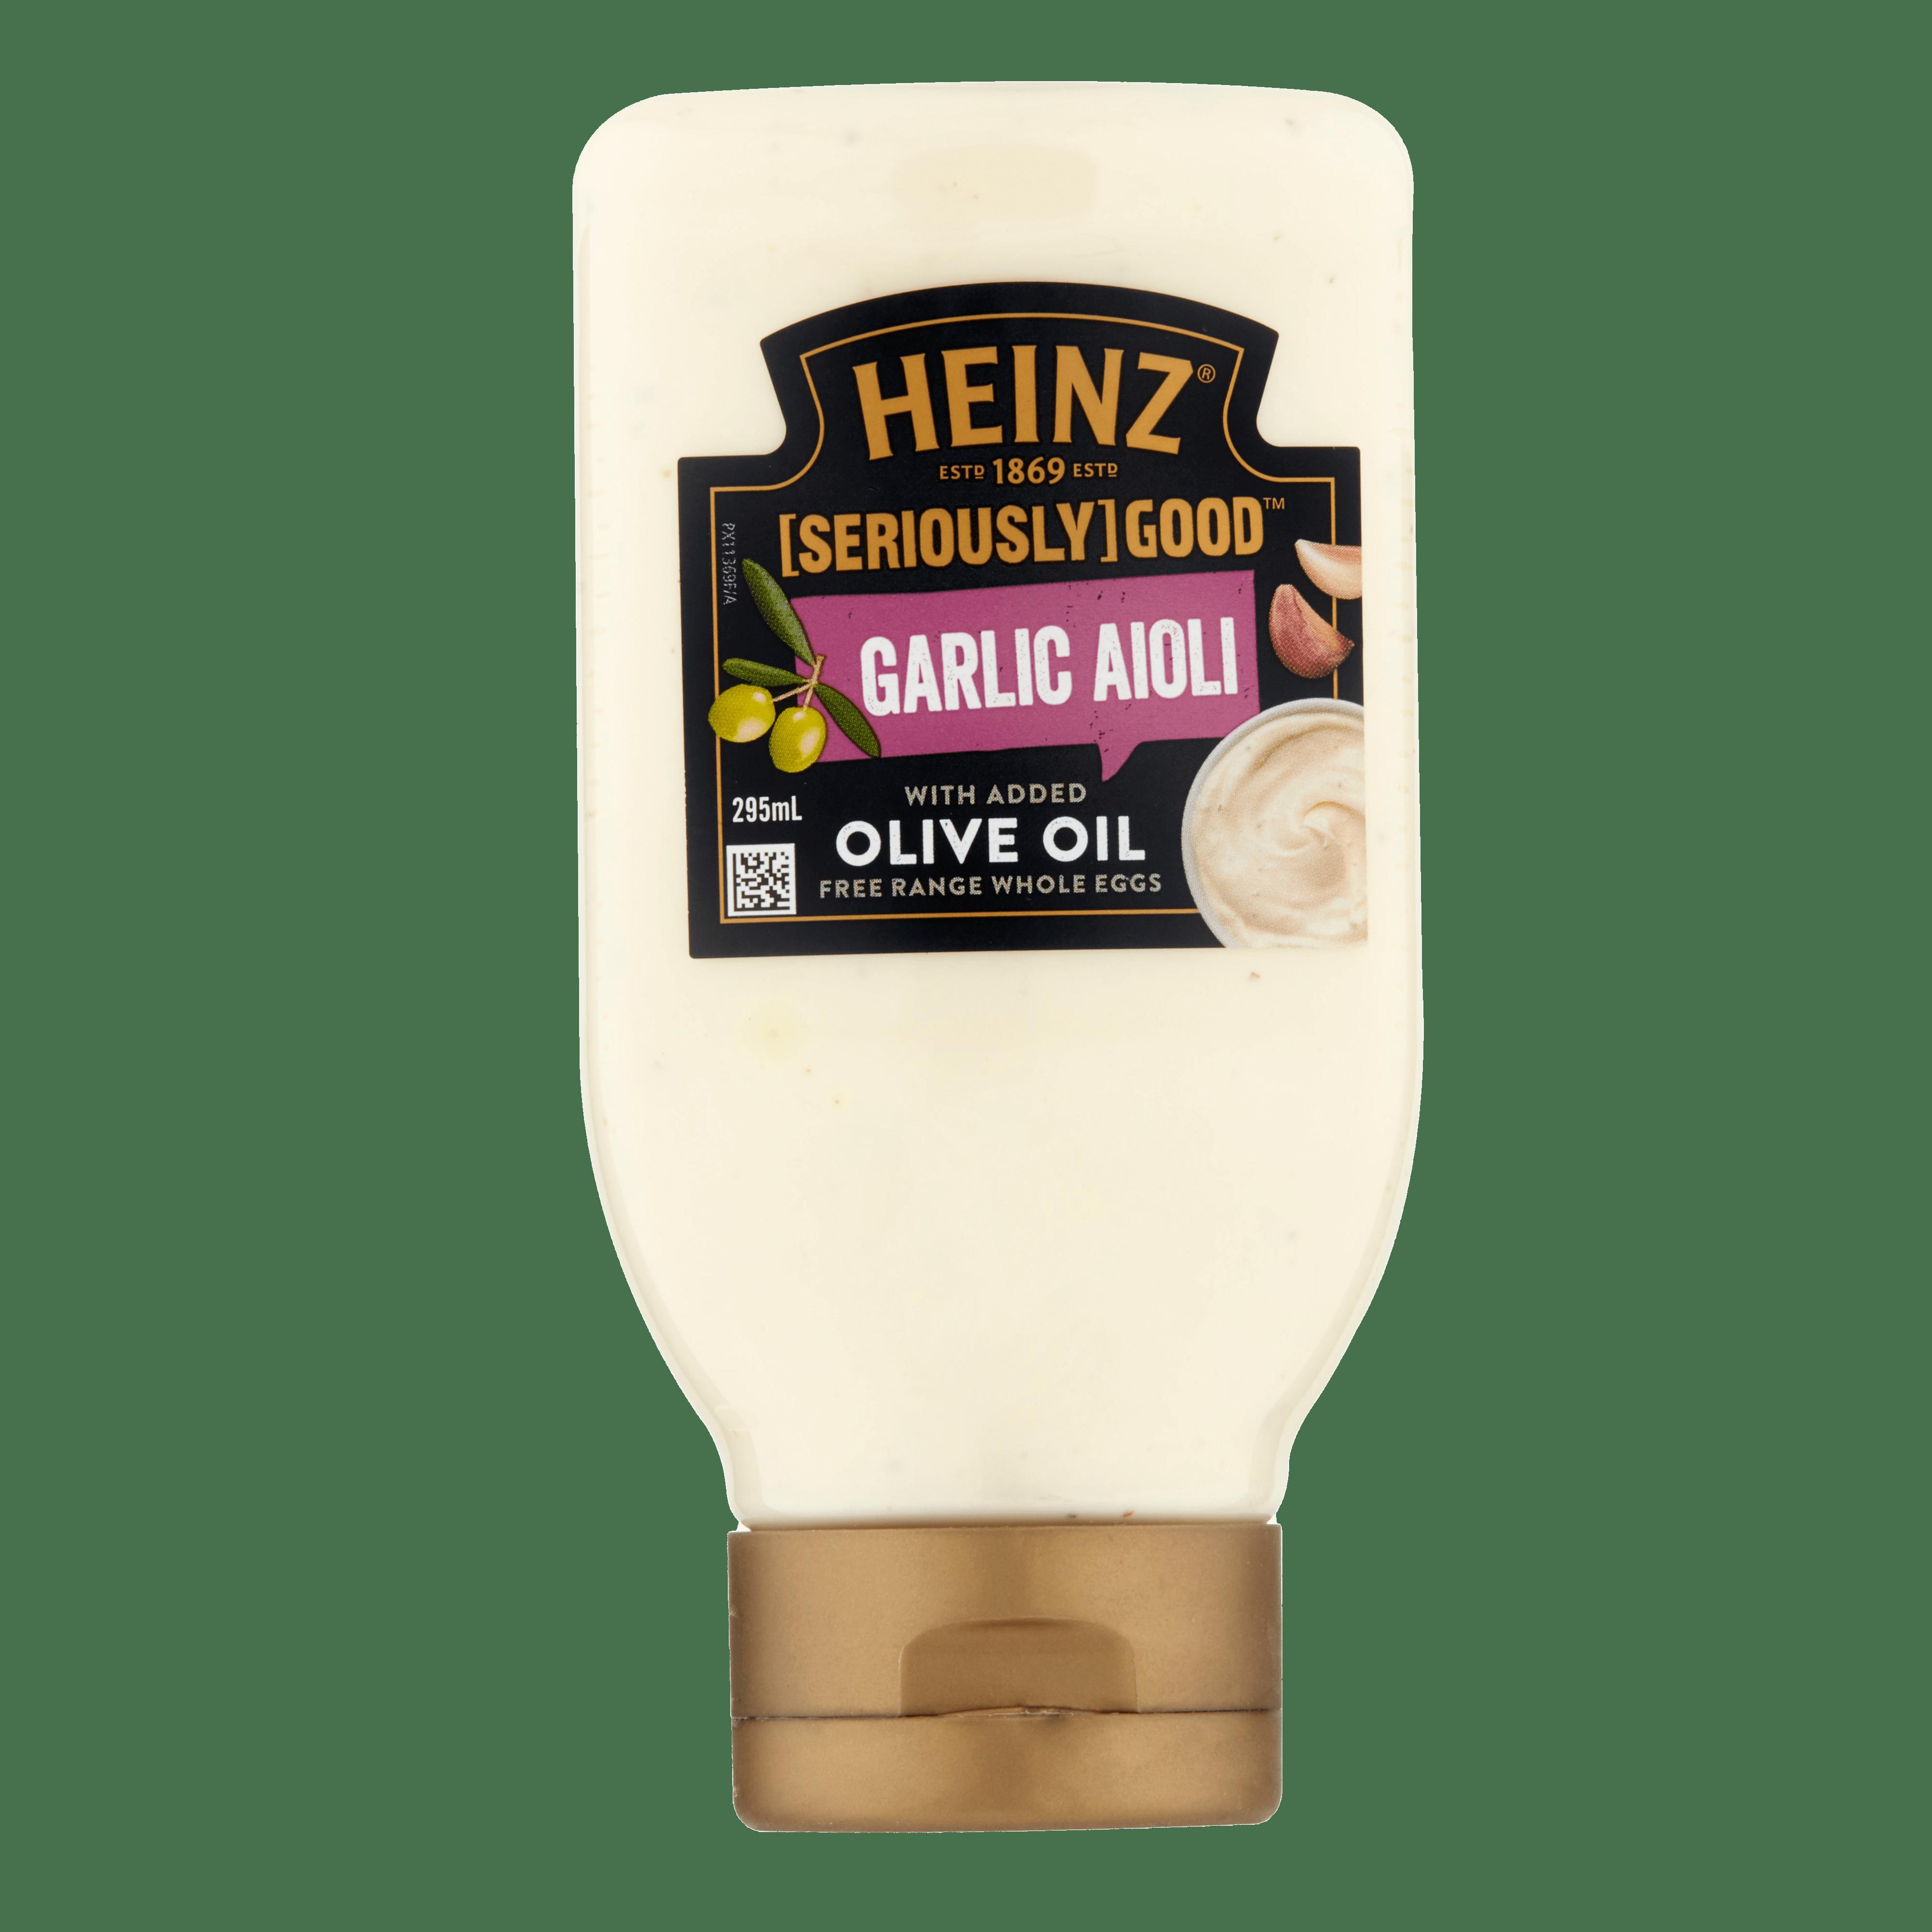 Garlic Aioli with Olive Oil